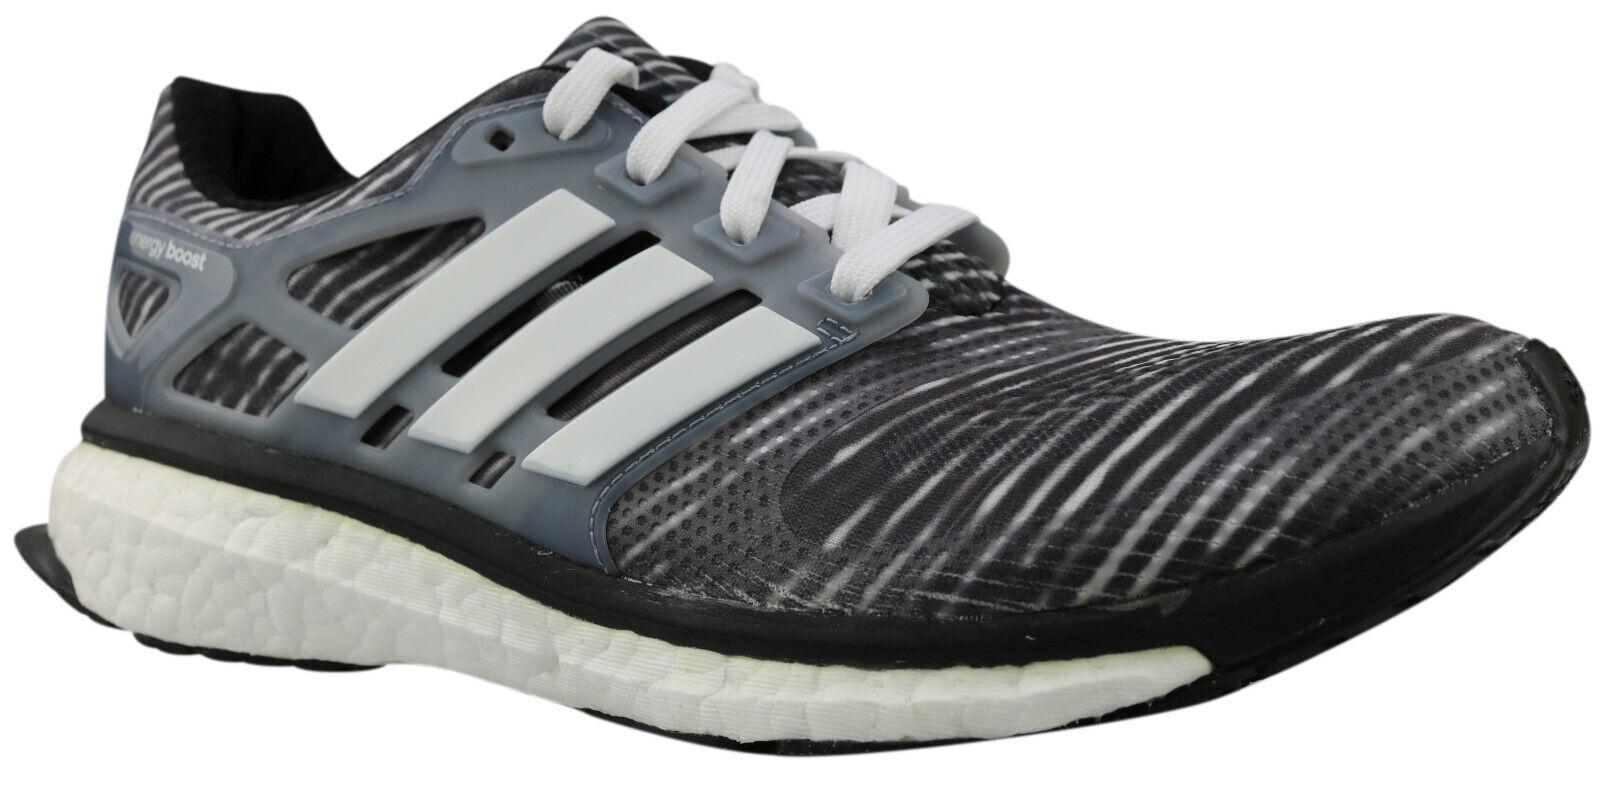 Adidas Energy Boost ESM Laufschuhe Turnschuhe Herren B23155 Gr. 40 40,5 41 42 NEU